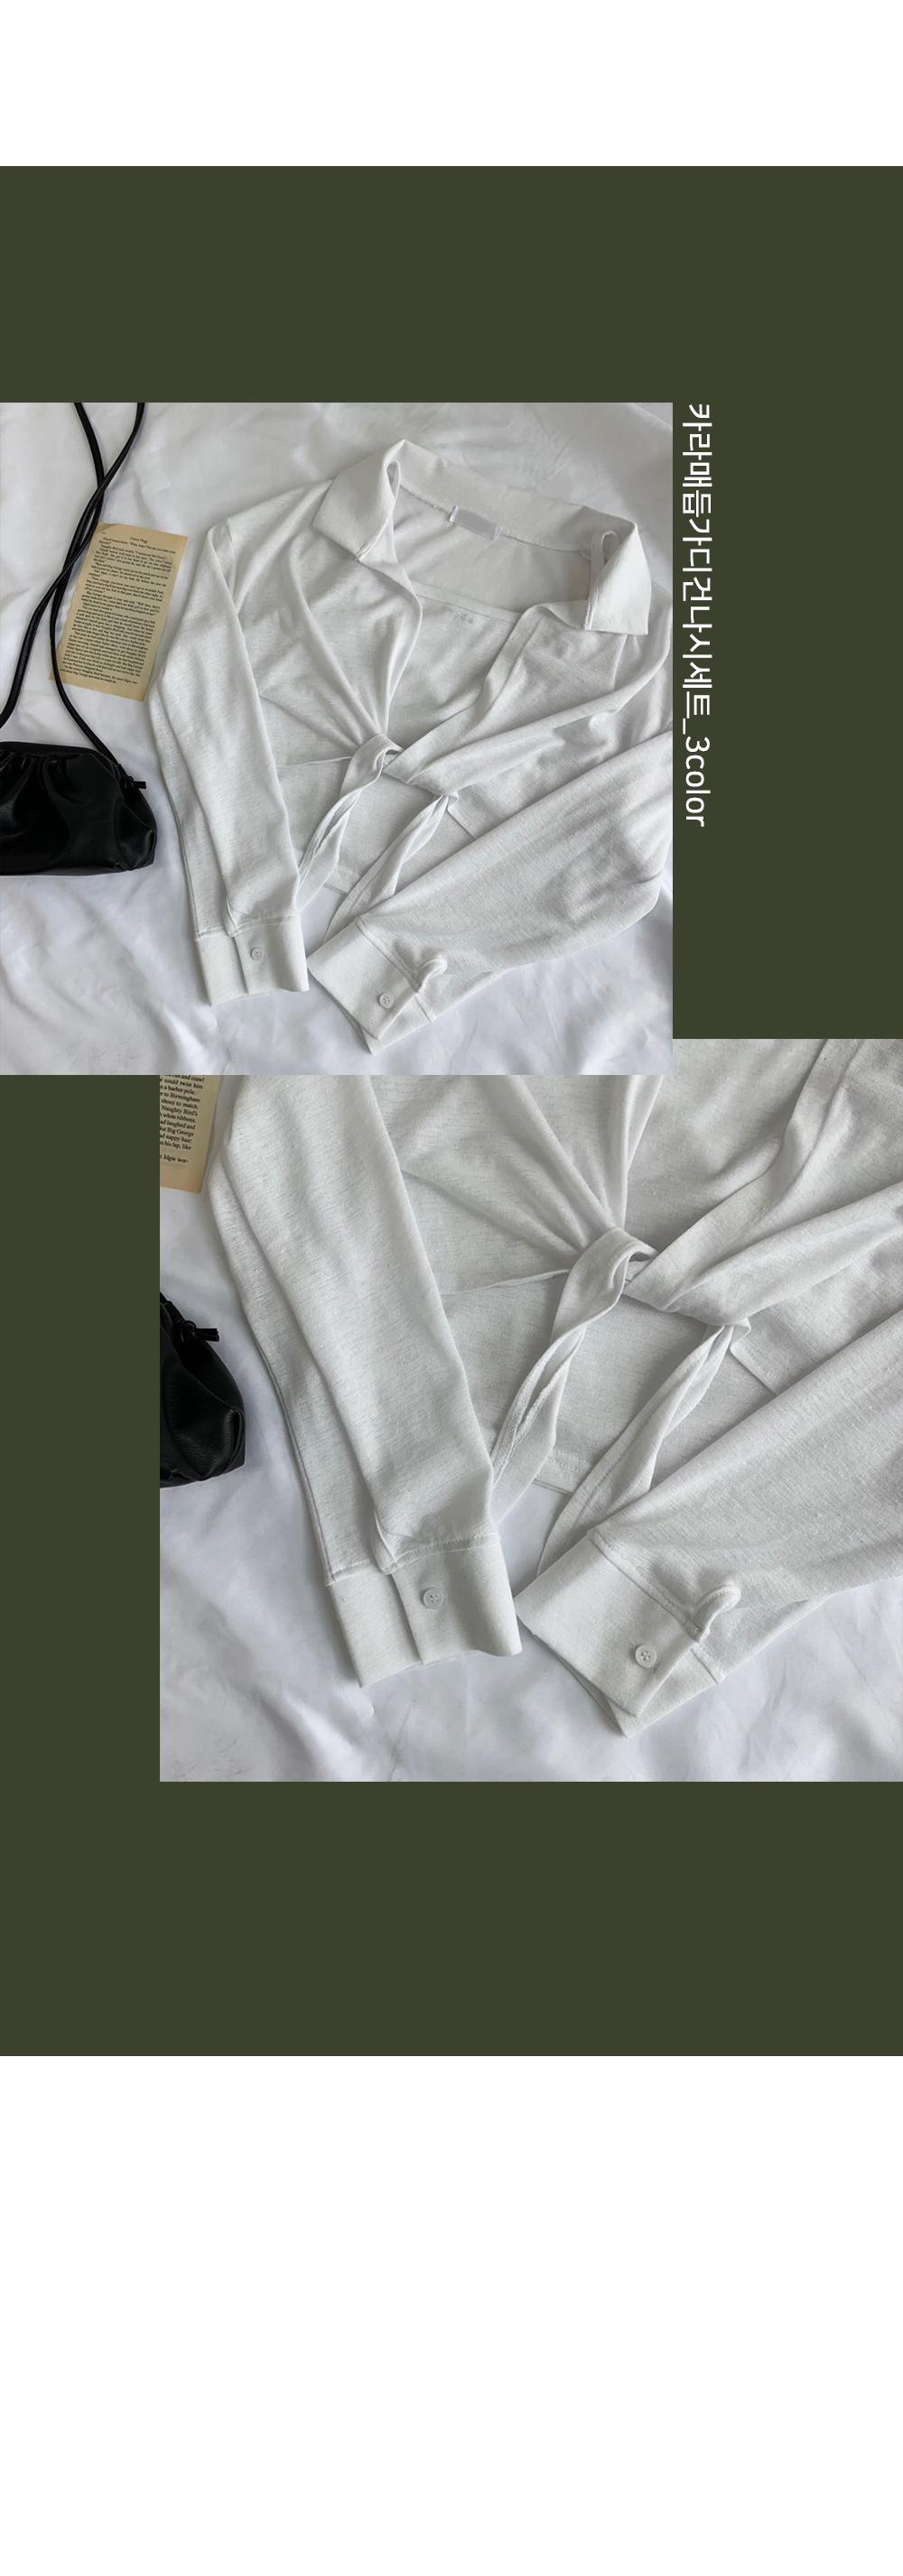 Collar Knot Cardigan Sleeveless Set